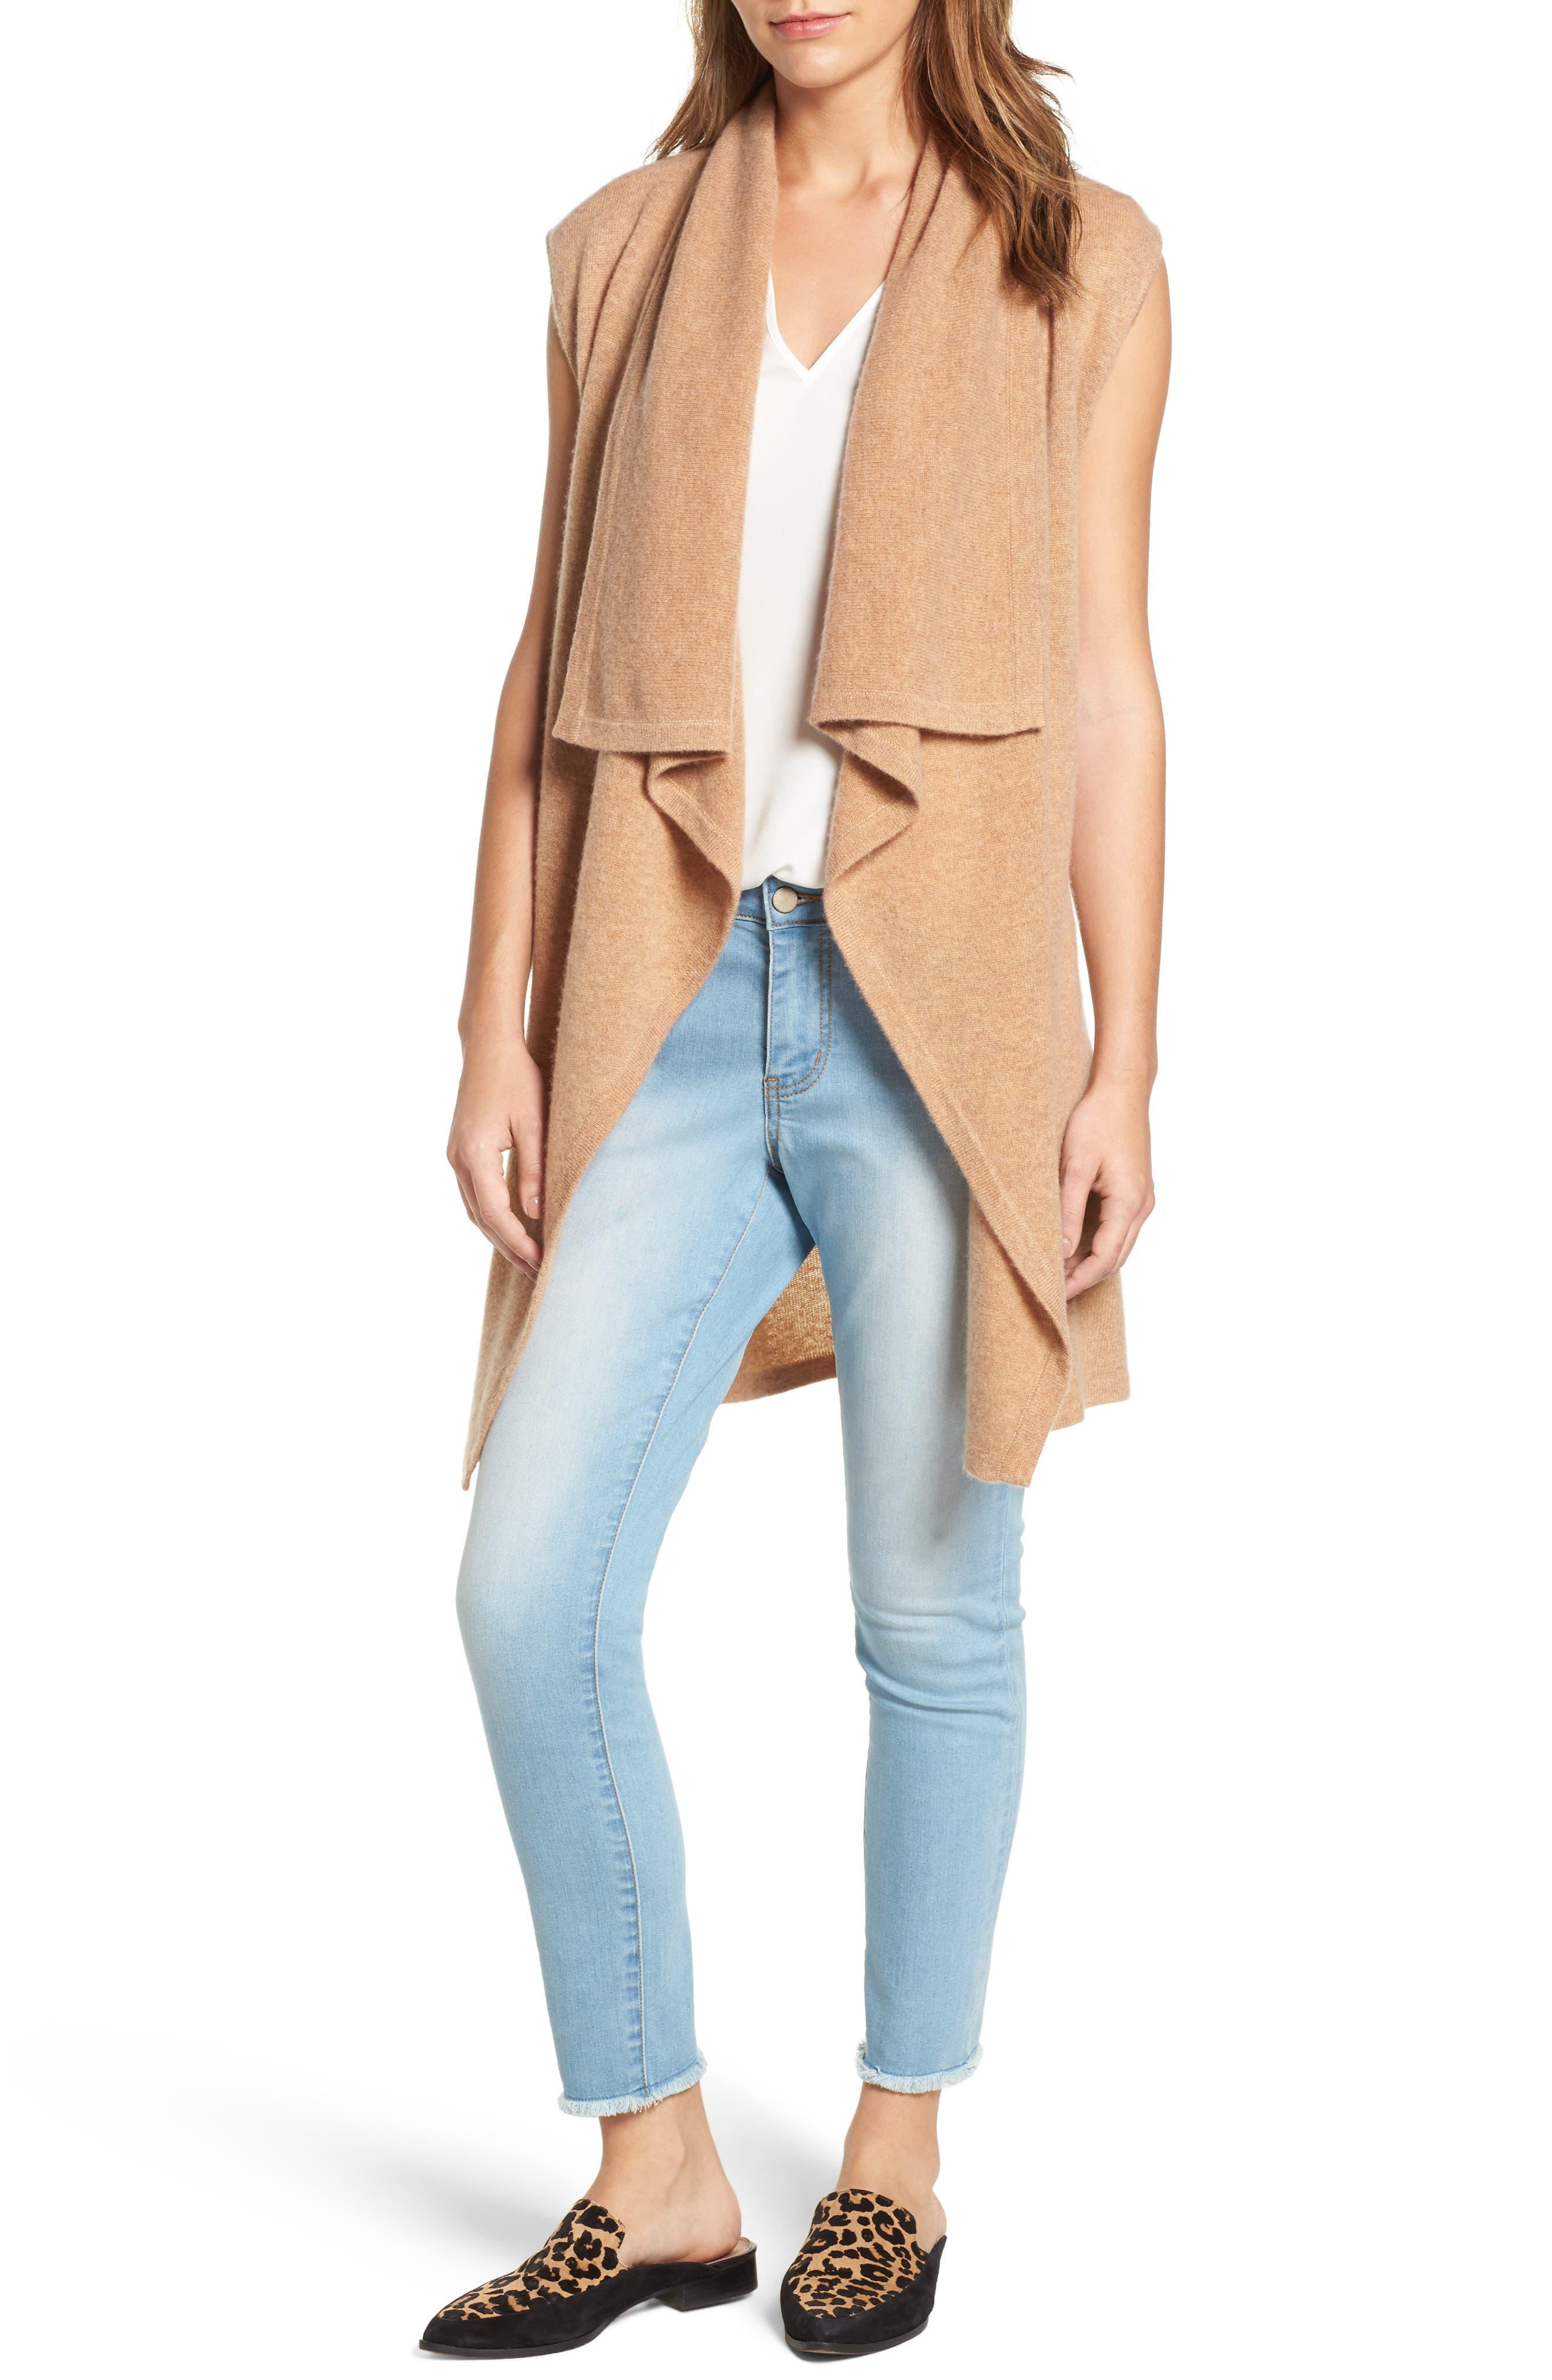 Alternate Image 1 Selected - Halogen® Waterfall Drape Front Cashmere Vest